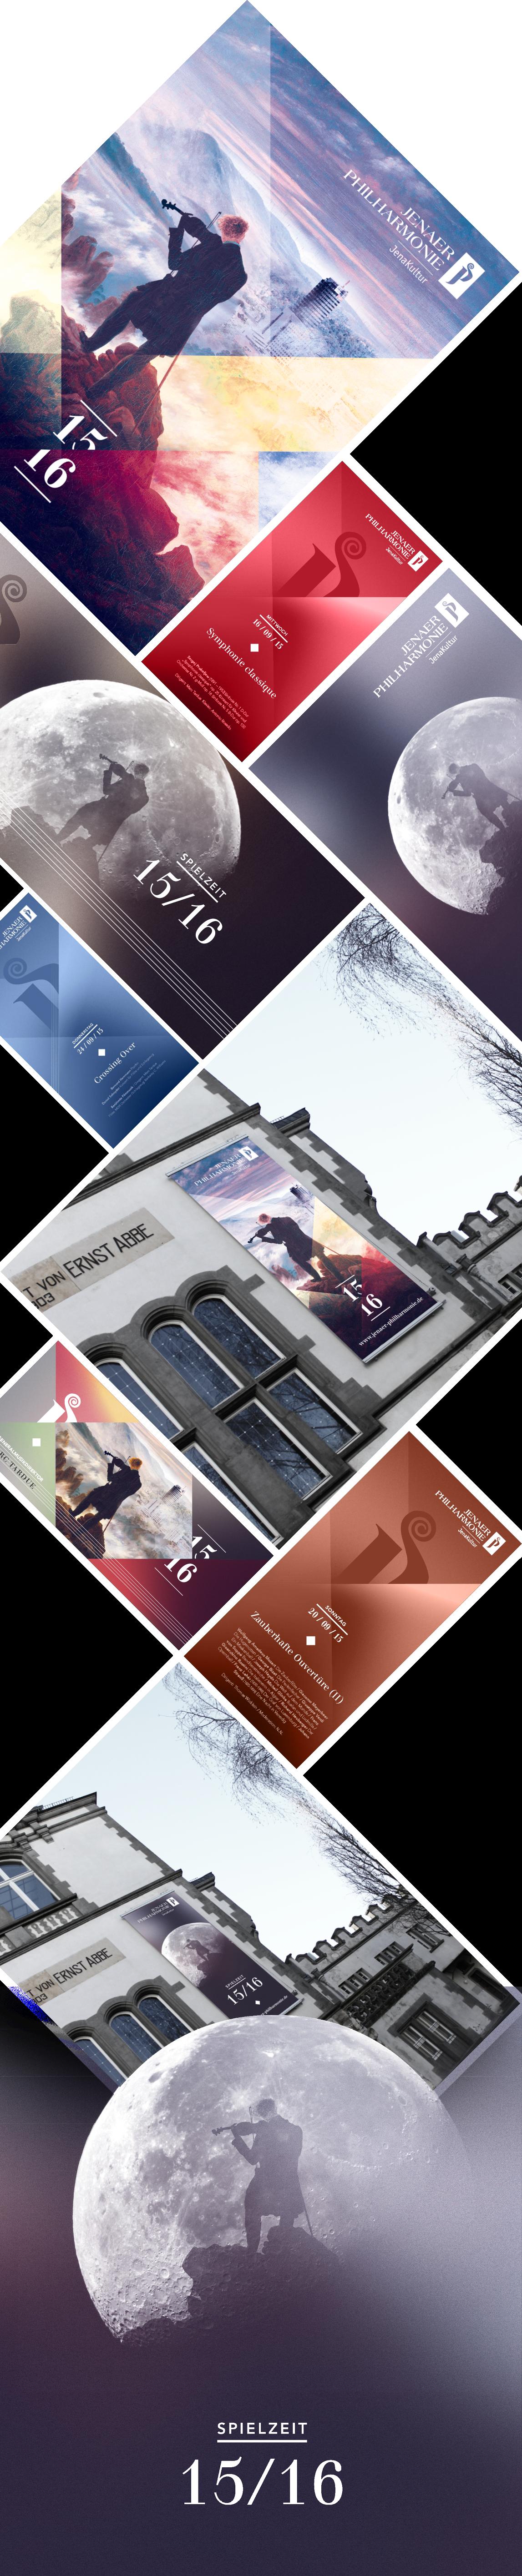 Samt&Seidel_Referenz_Jenaer_Philharmonie_Design_